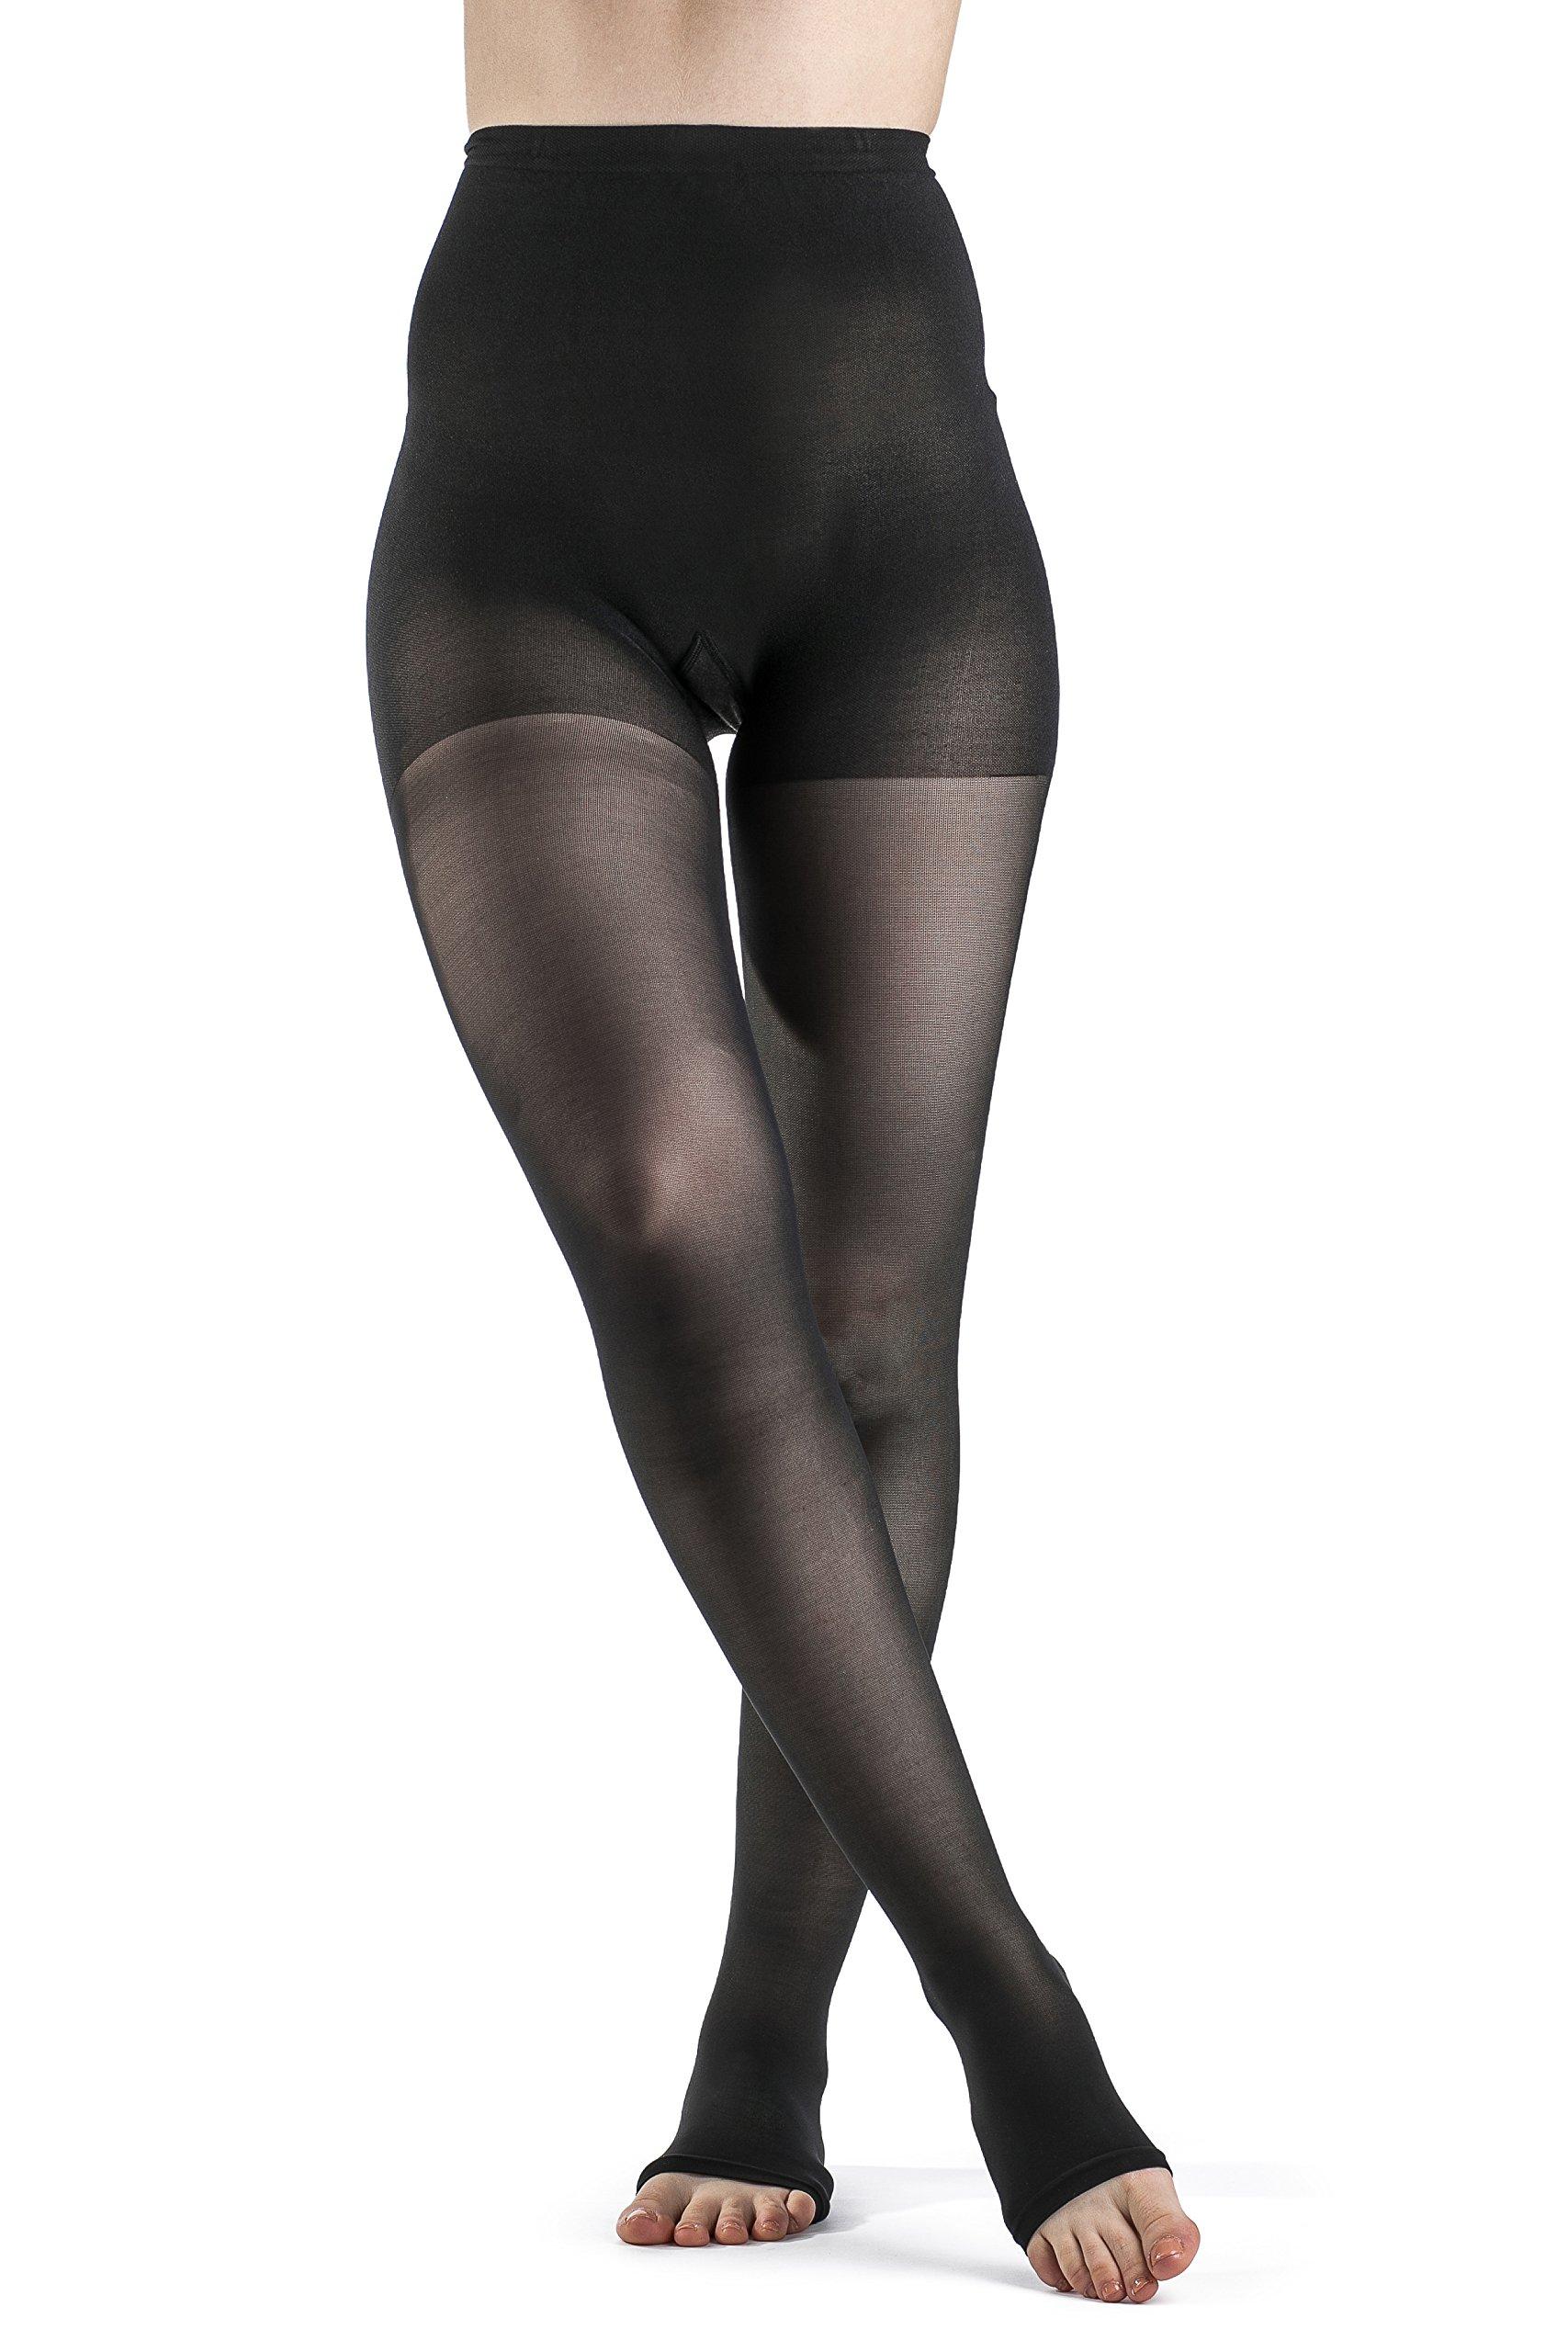 SIGVARIS Women's EVERSHEER 780 Open Toe Waist-High Compression Pantyhose 20-30mmHg